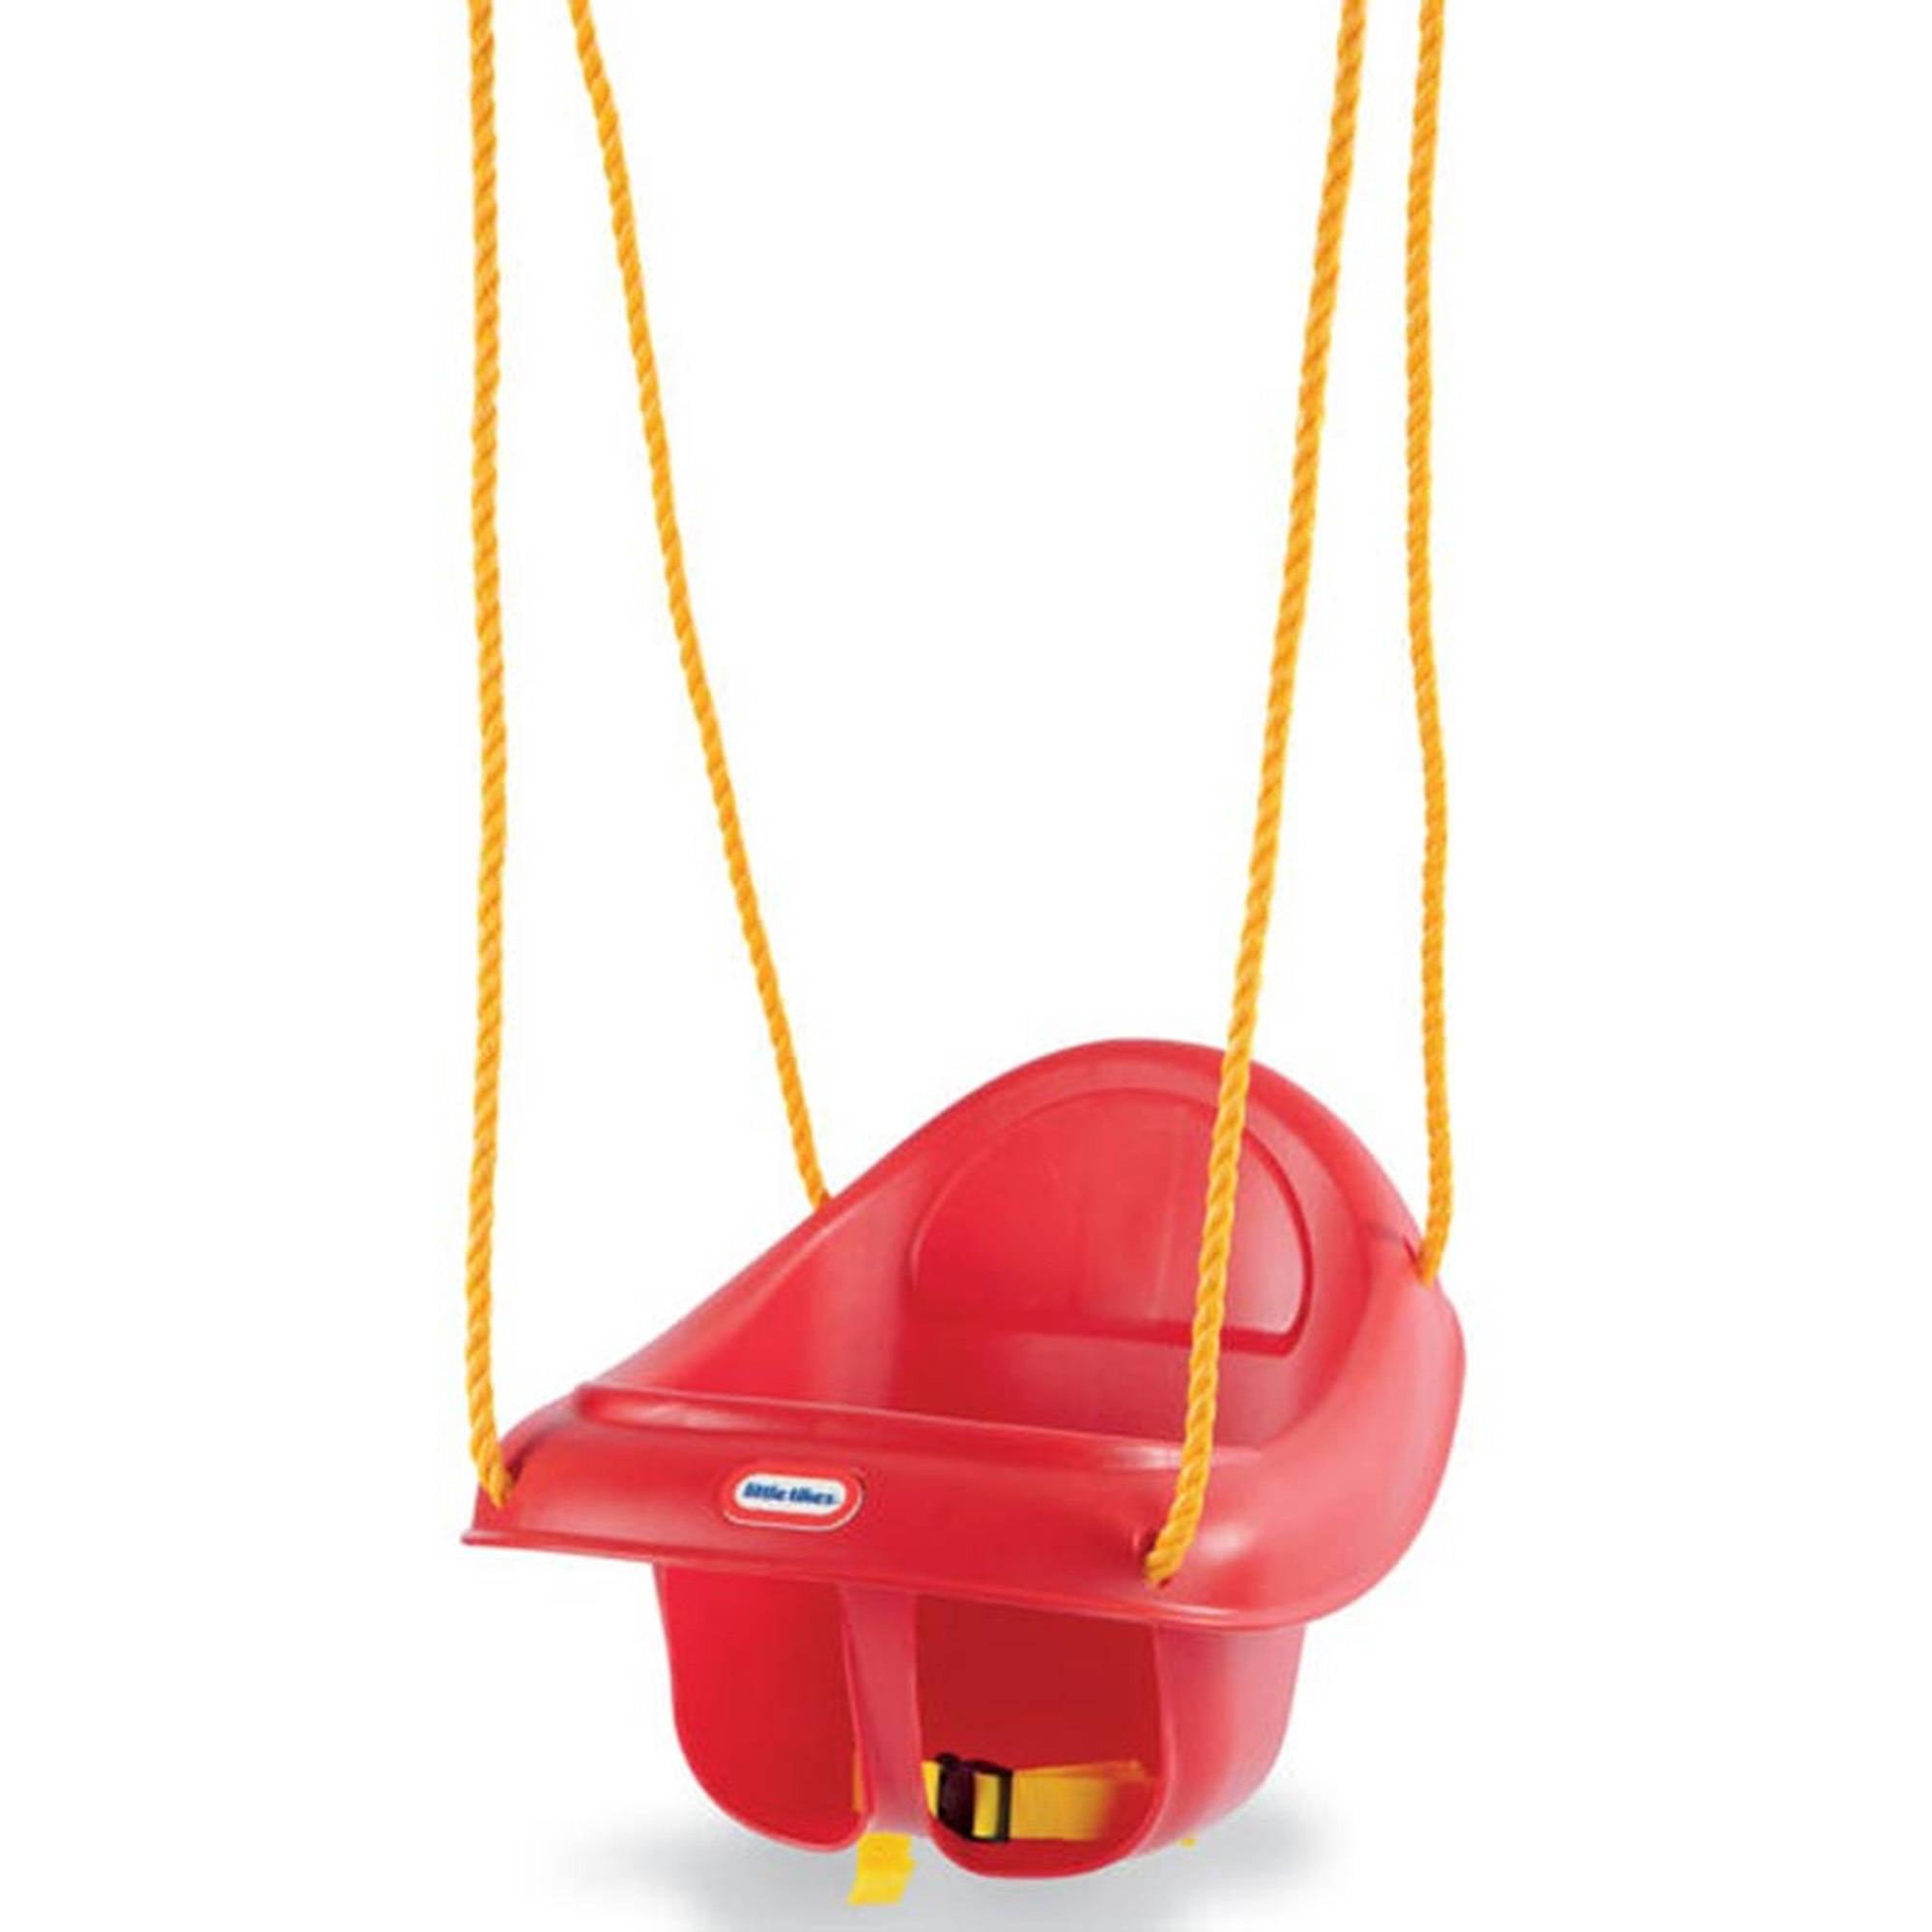 Little Tikes High Back Toddler Swing Retail Packaging